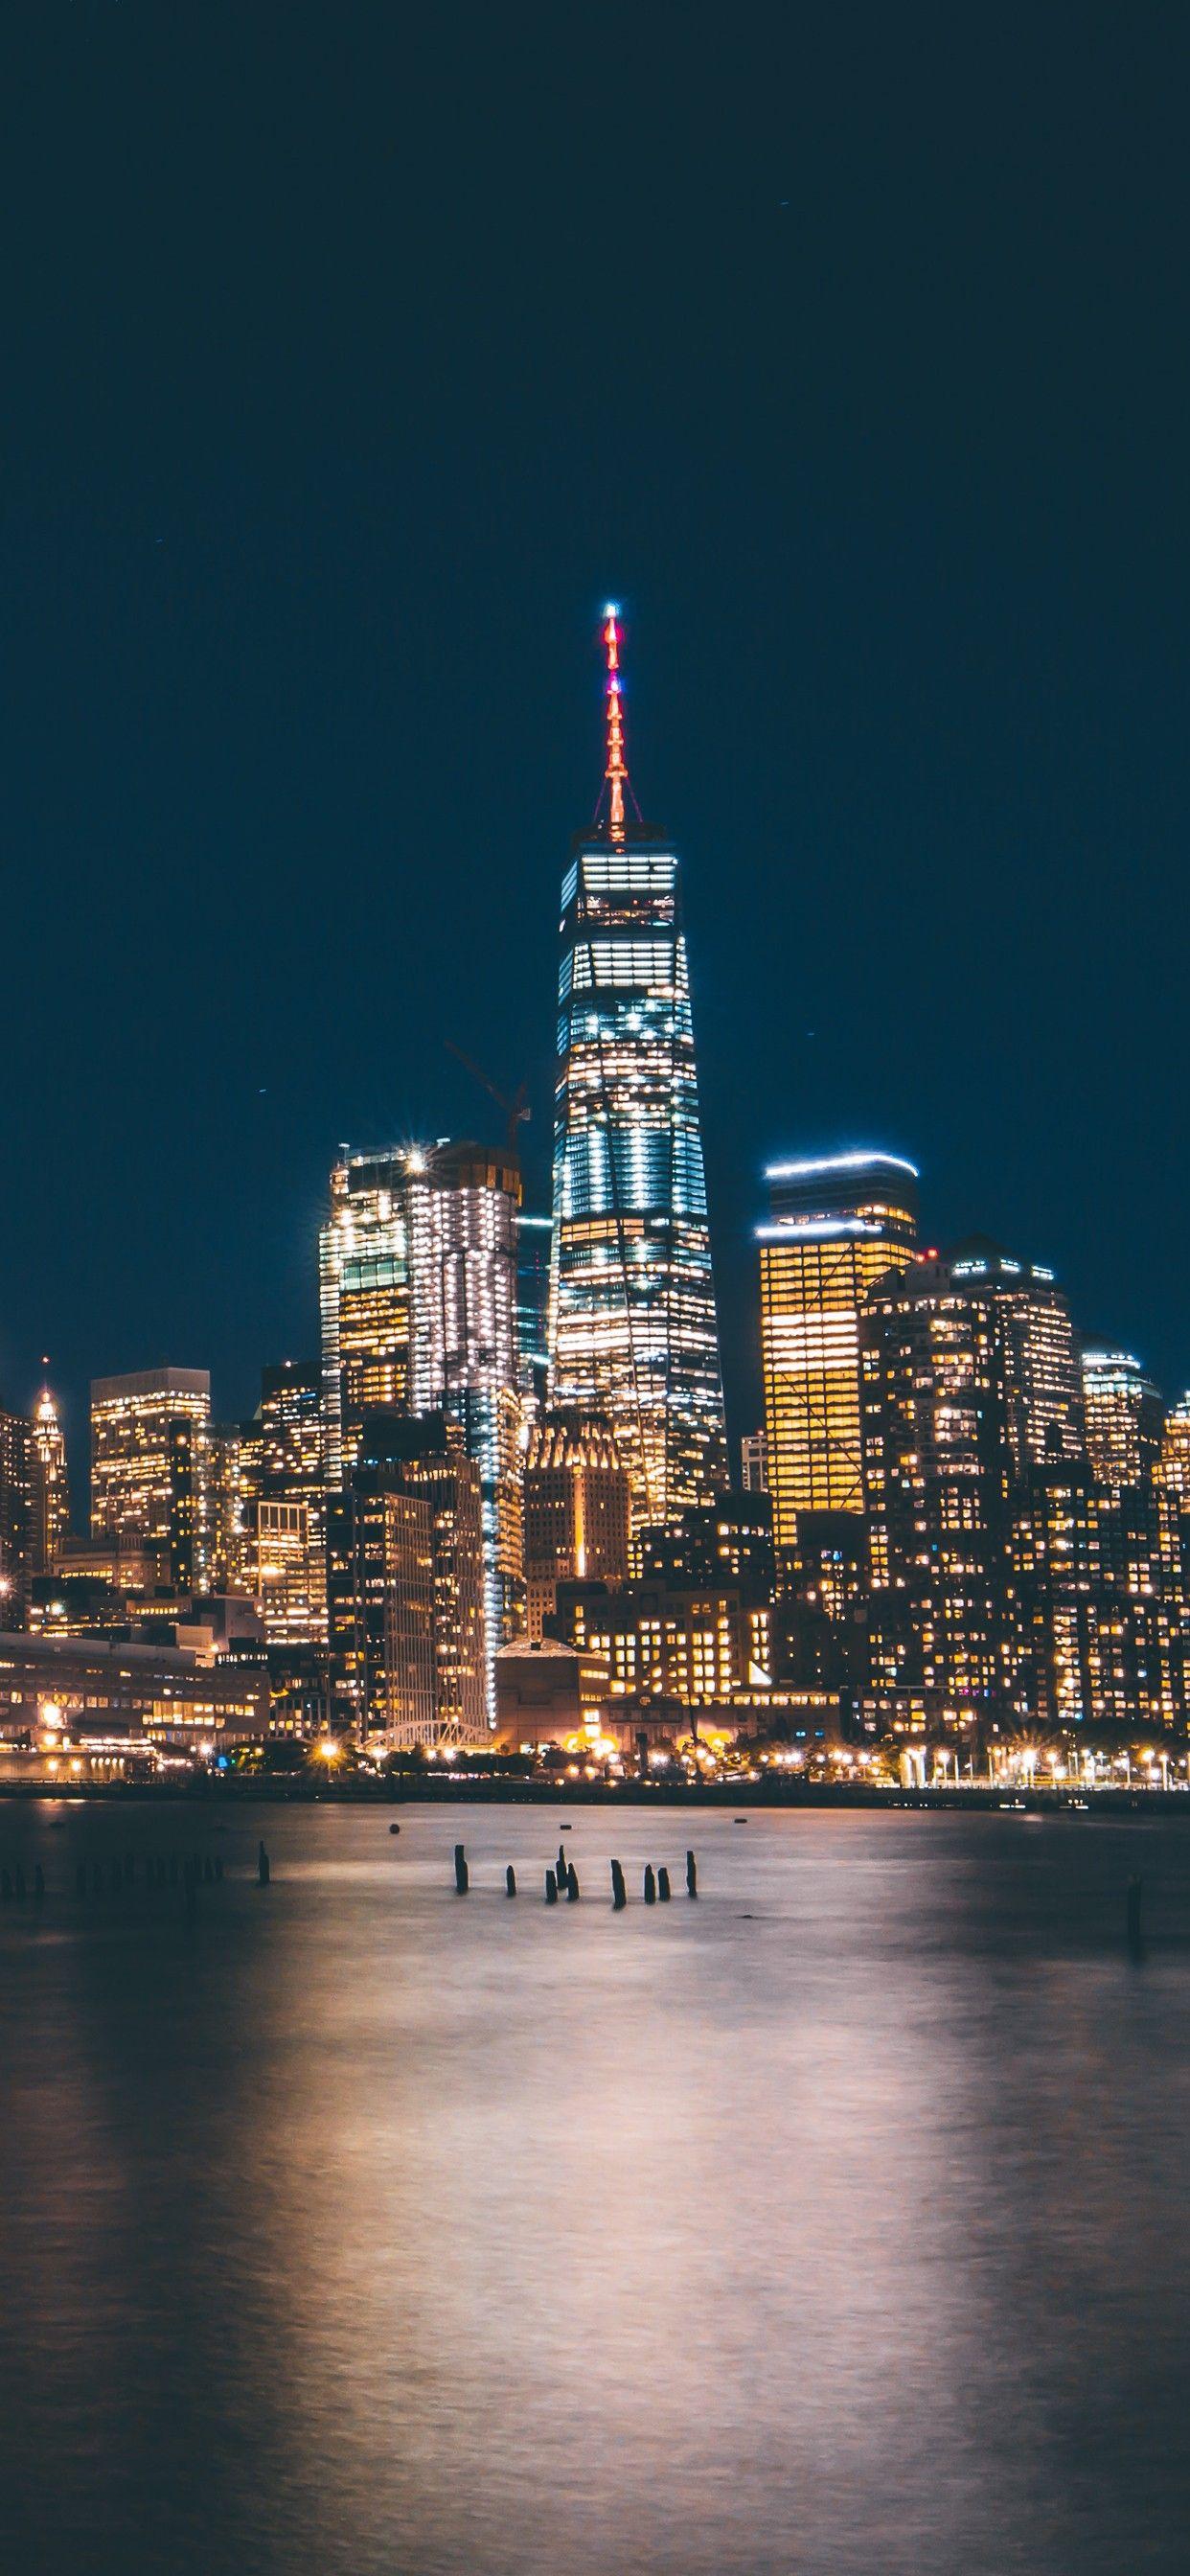 Luxury New York Live Wallpaper Fondo Iphone Fotos De Fondo De Pantalla Iphone Fondos De Pantalla